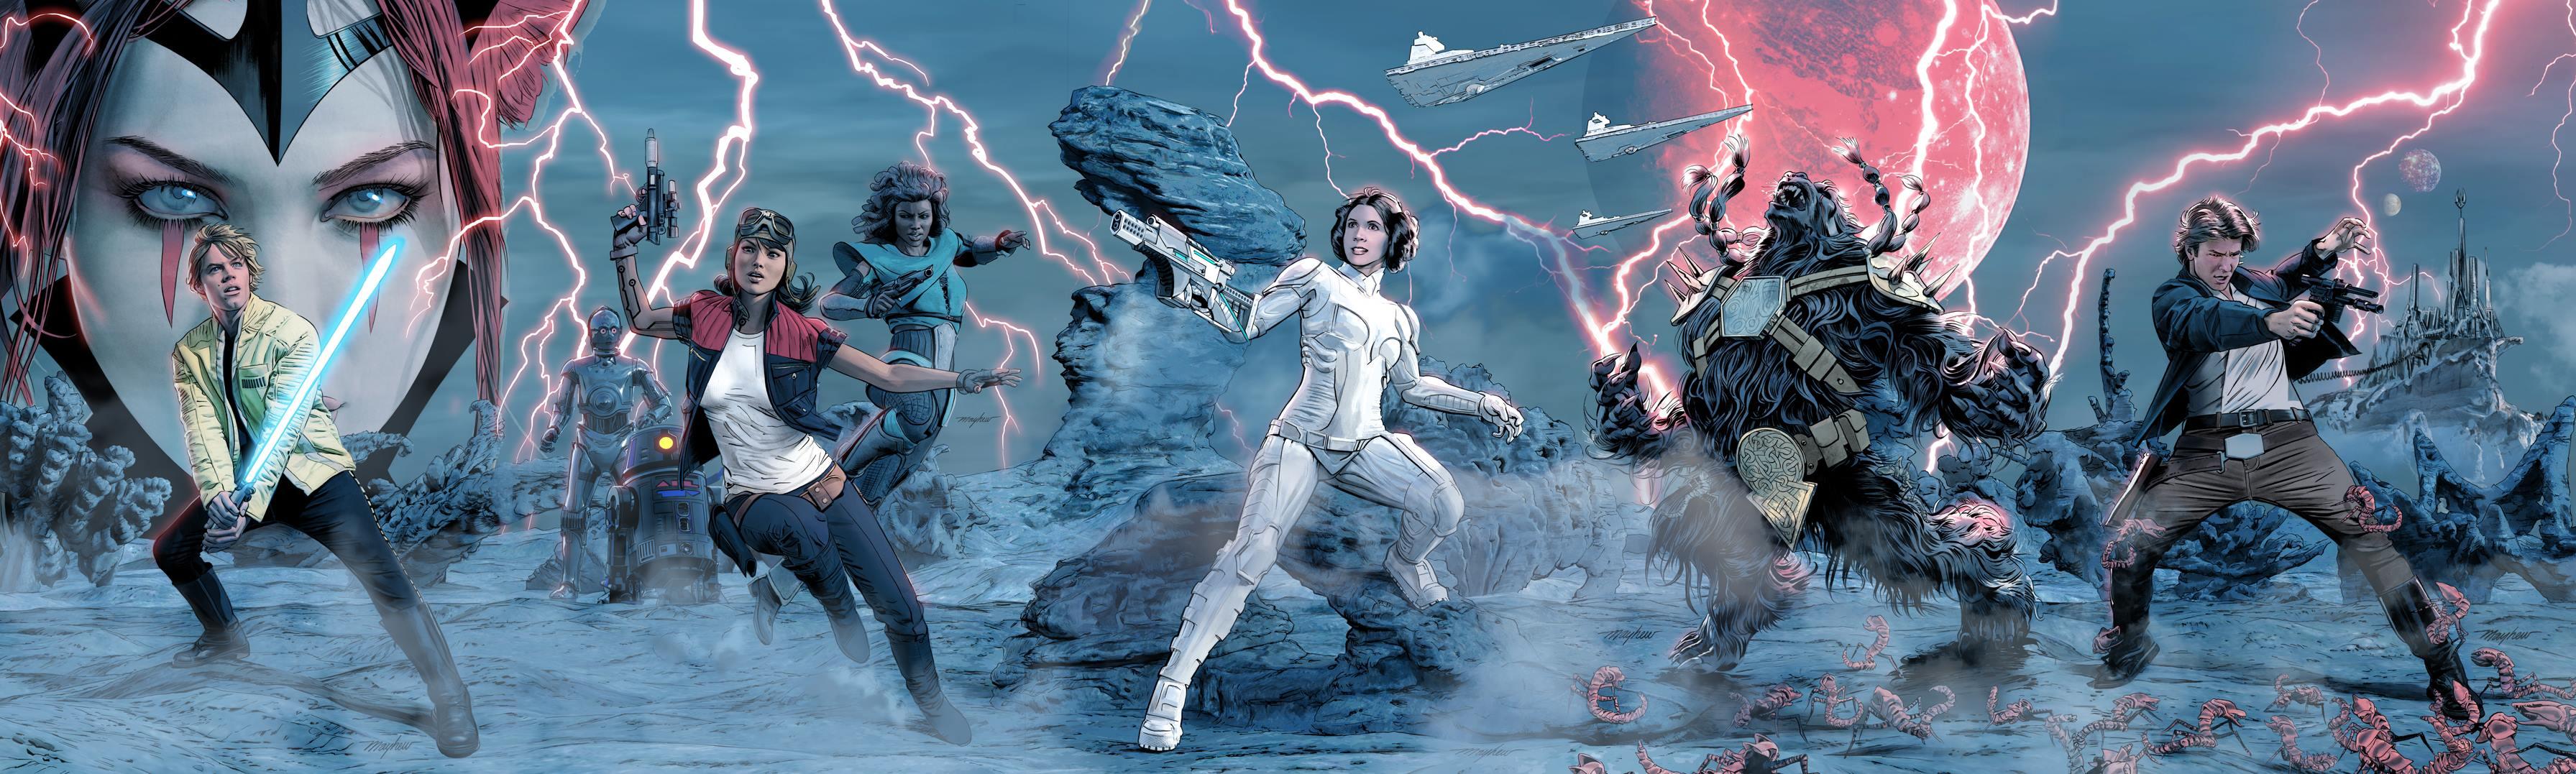 Star Wars Screaming Citadel Marvel Graphic Novel Comic Book